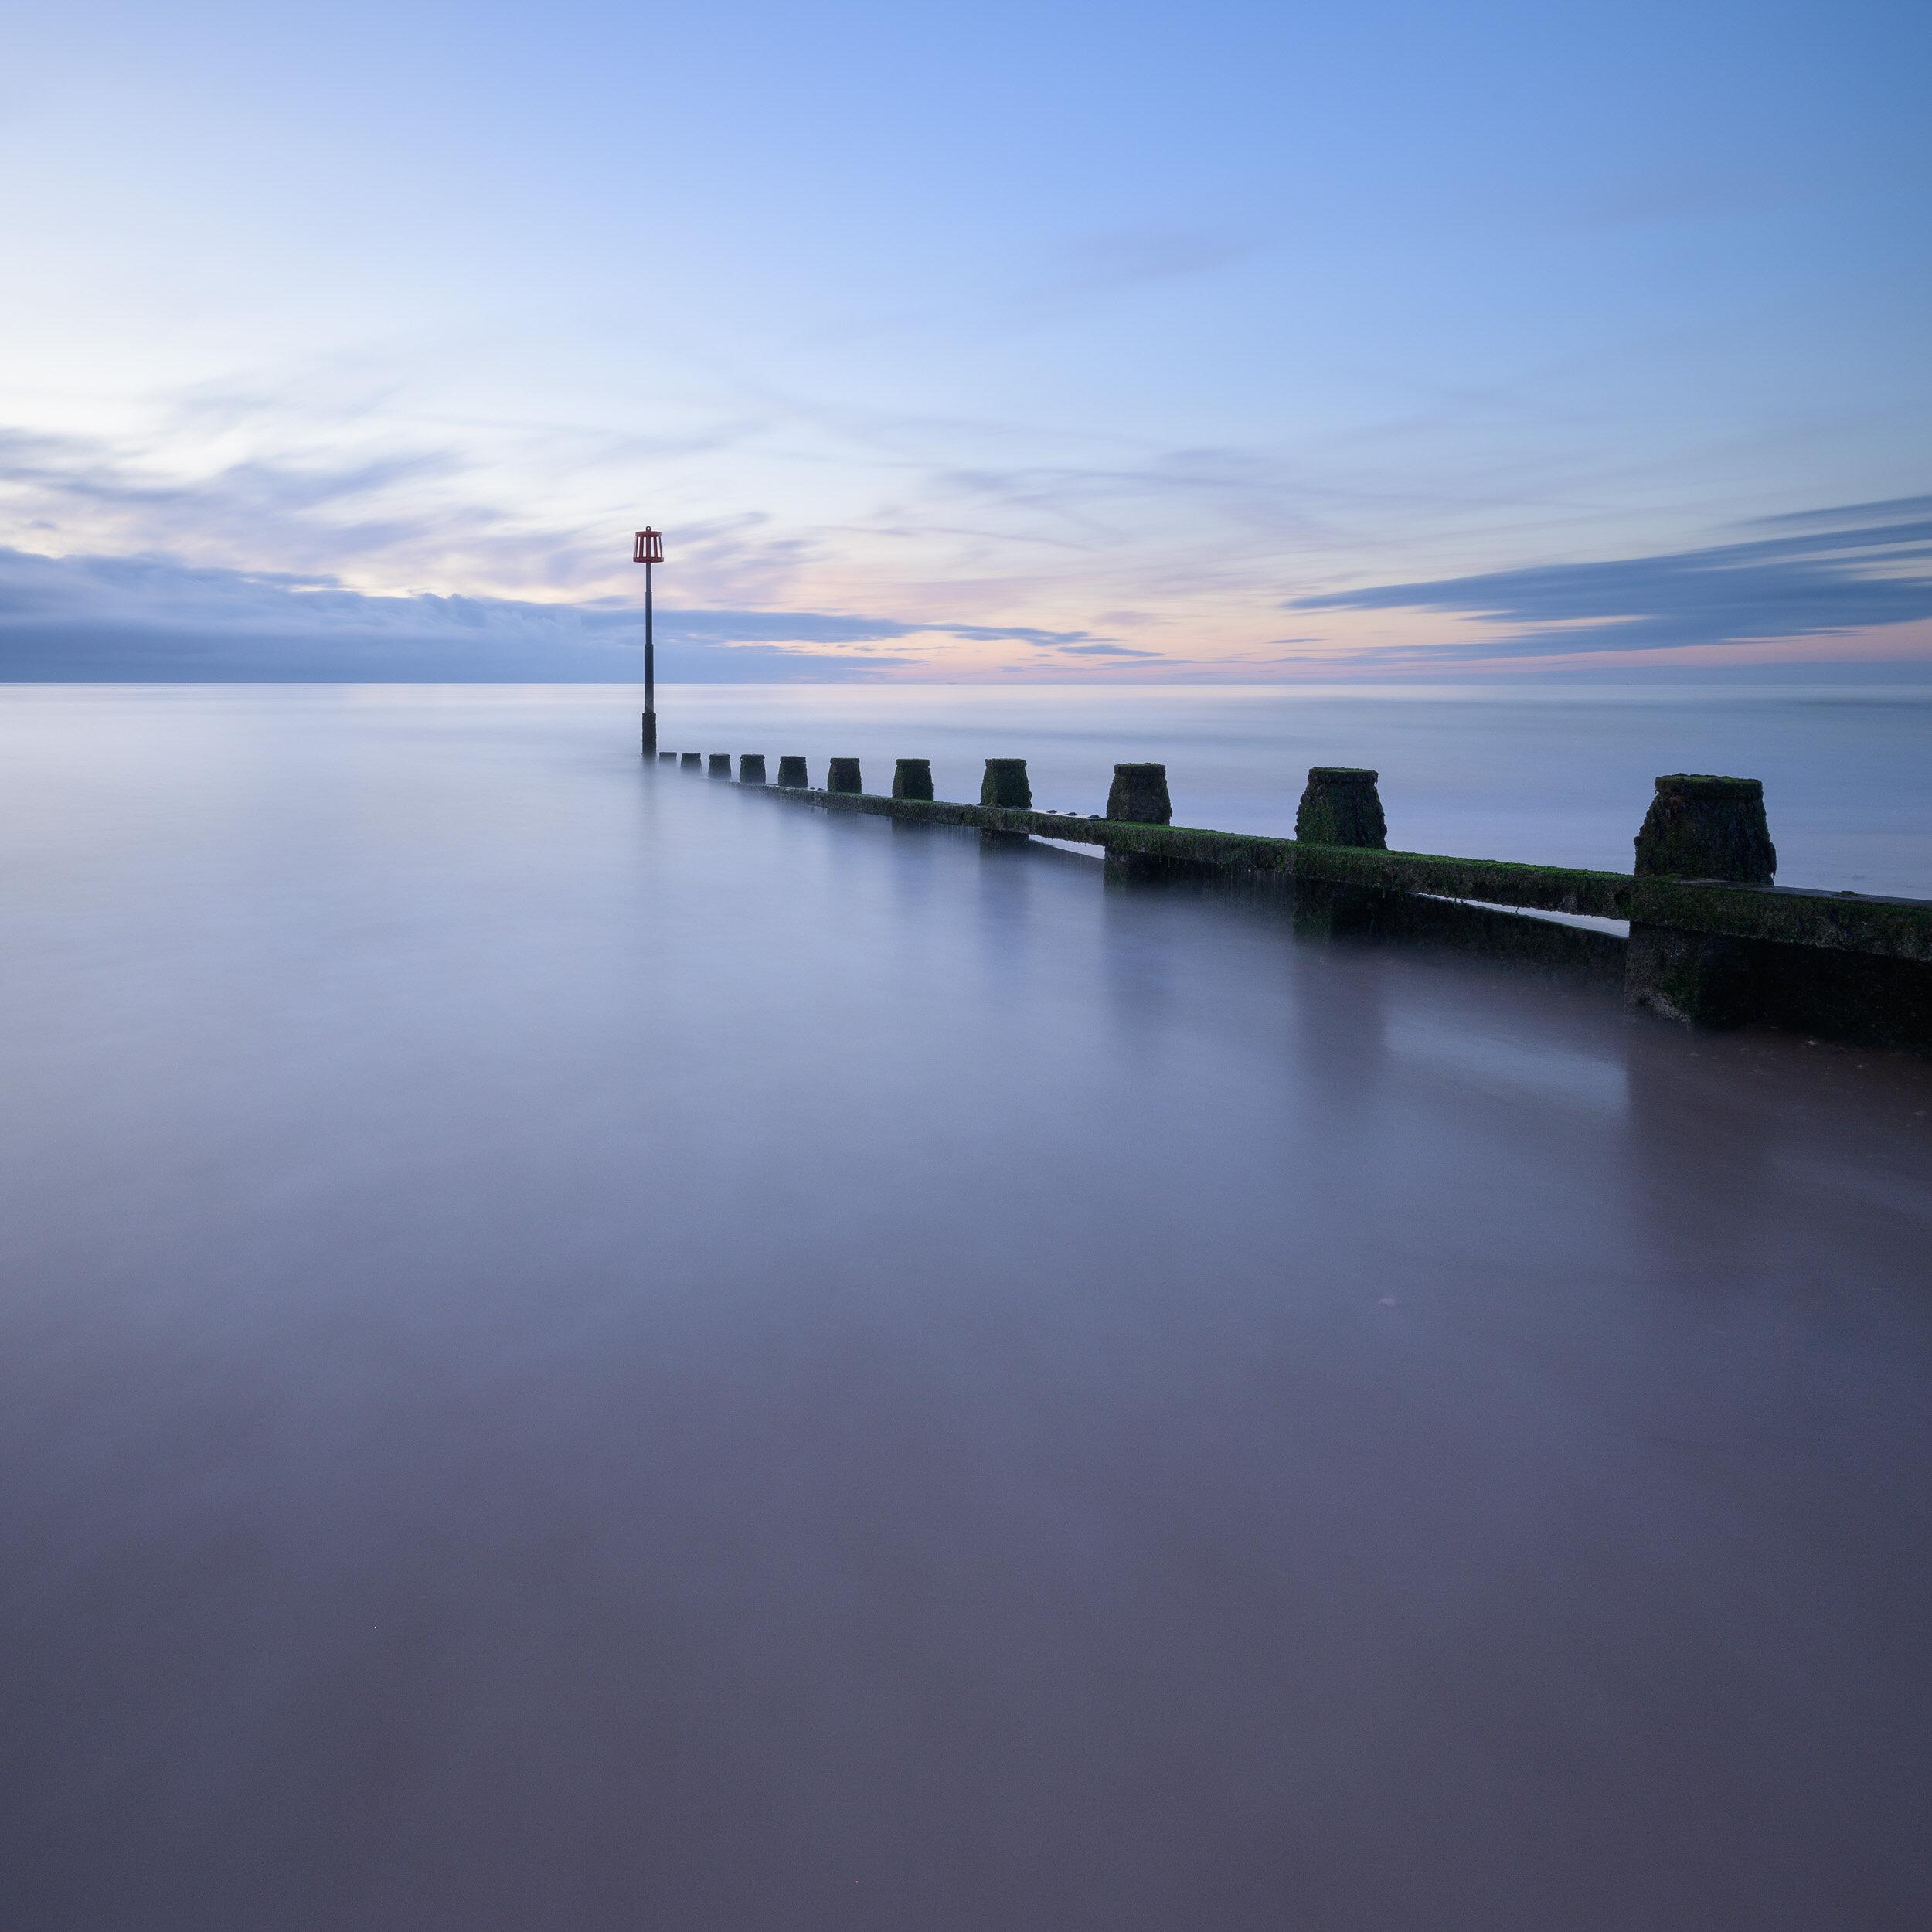 Dawn at Dawlish Warren, Devon  - Nikon Z7 with Nikkor Z 14-30 mm f/4 at 14 mm, f/13, 99 sec at ISO 64, Kase Filters K8 holder, CPL, and 6 stop ND.